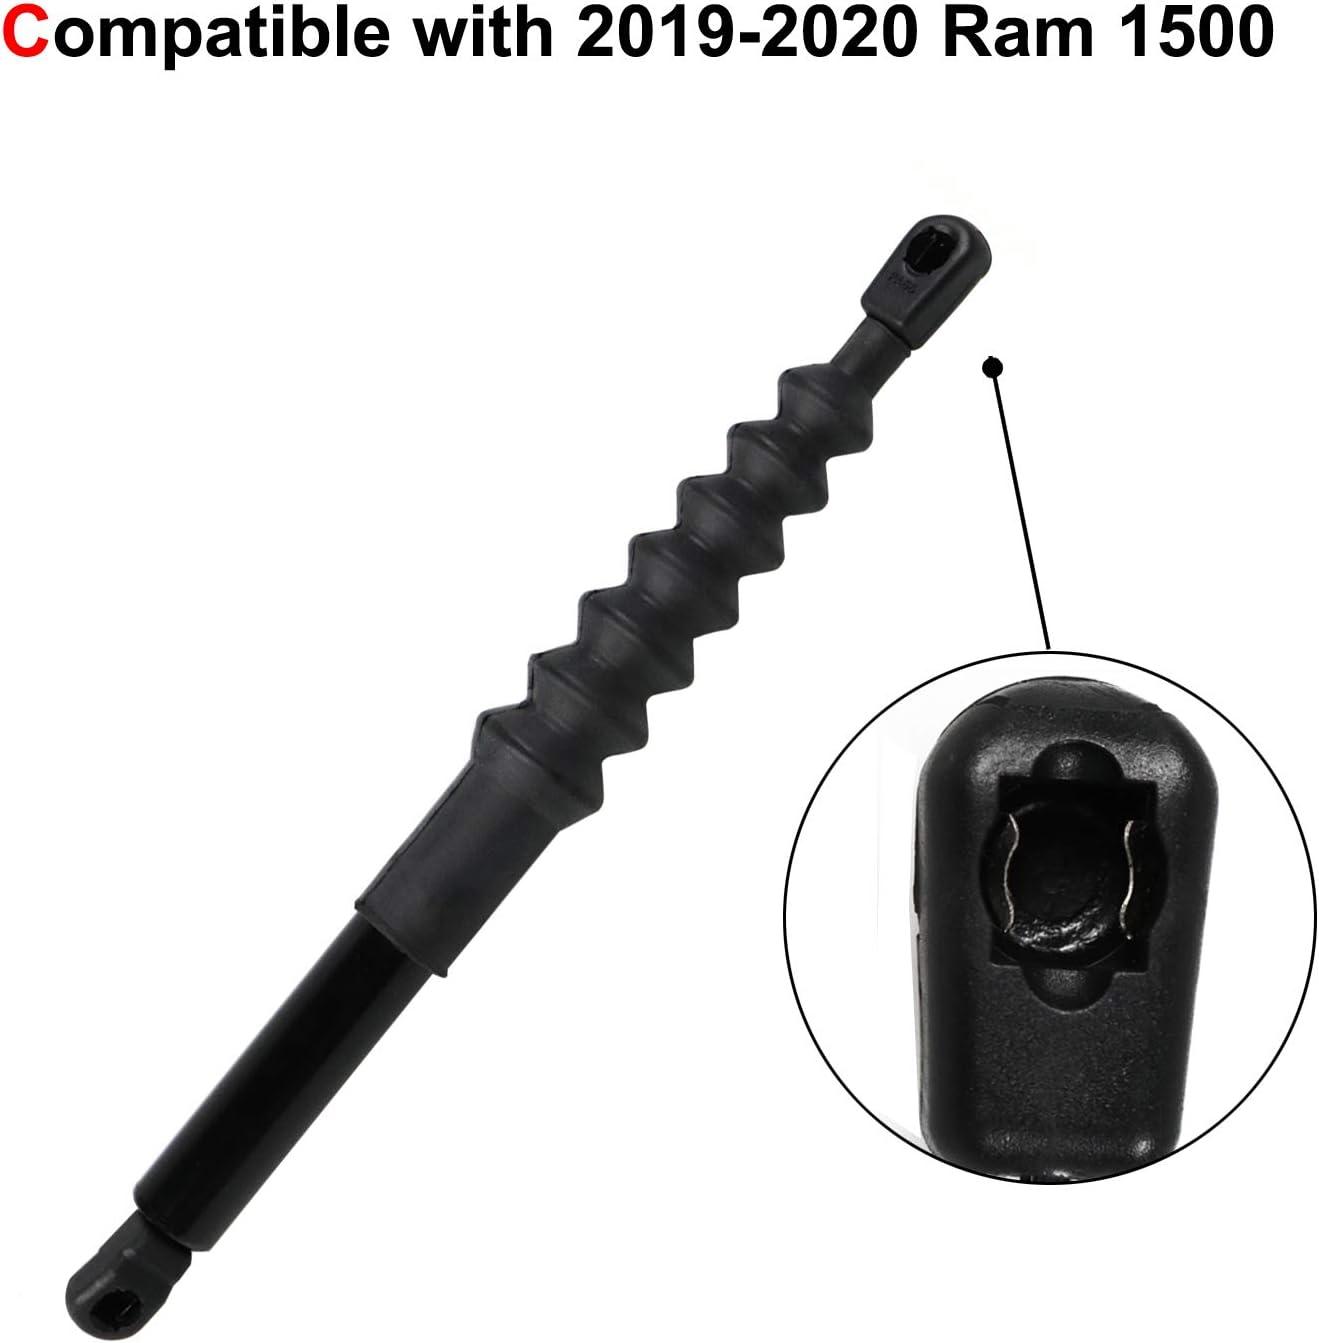 Ustand Truck Tailgate Assist Shock Struts for 2019-2020 Ram 1500